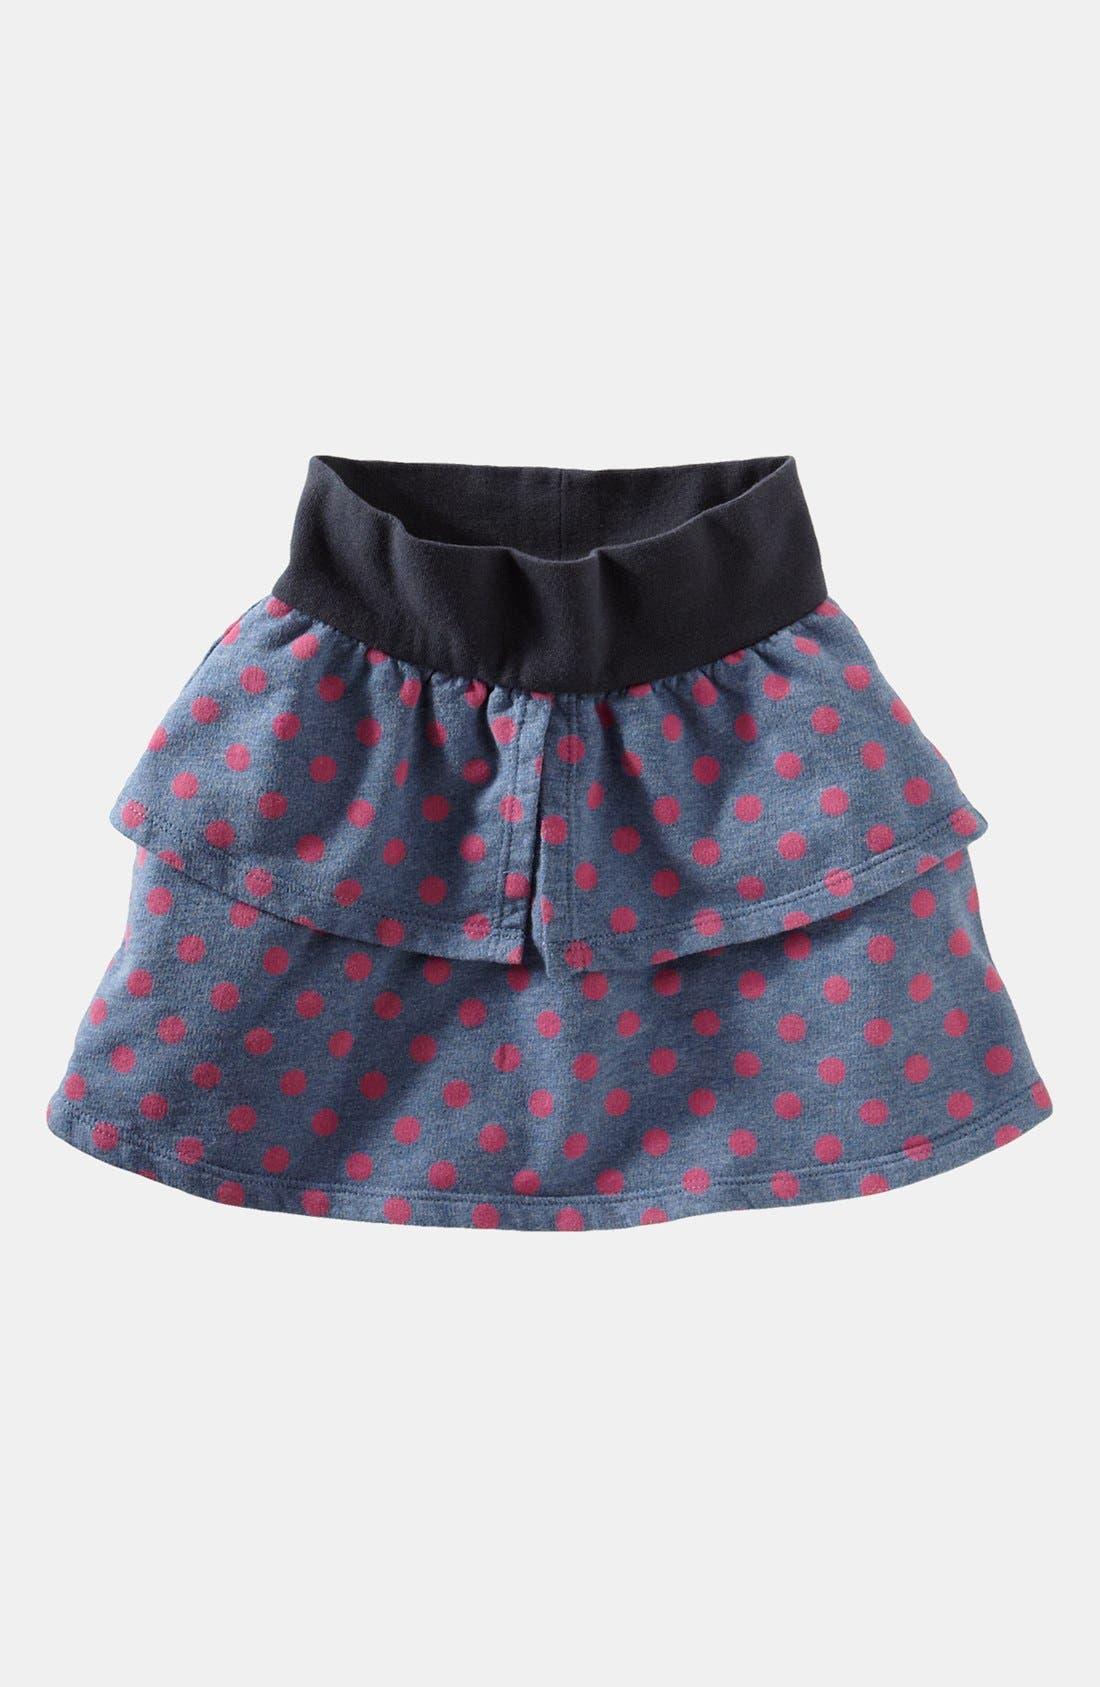 Alternate Image 1 Selected - Tea Collection 'Dancing Dot' Miniskirt (Toddler Girls, Little Girls & Big Girls)